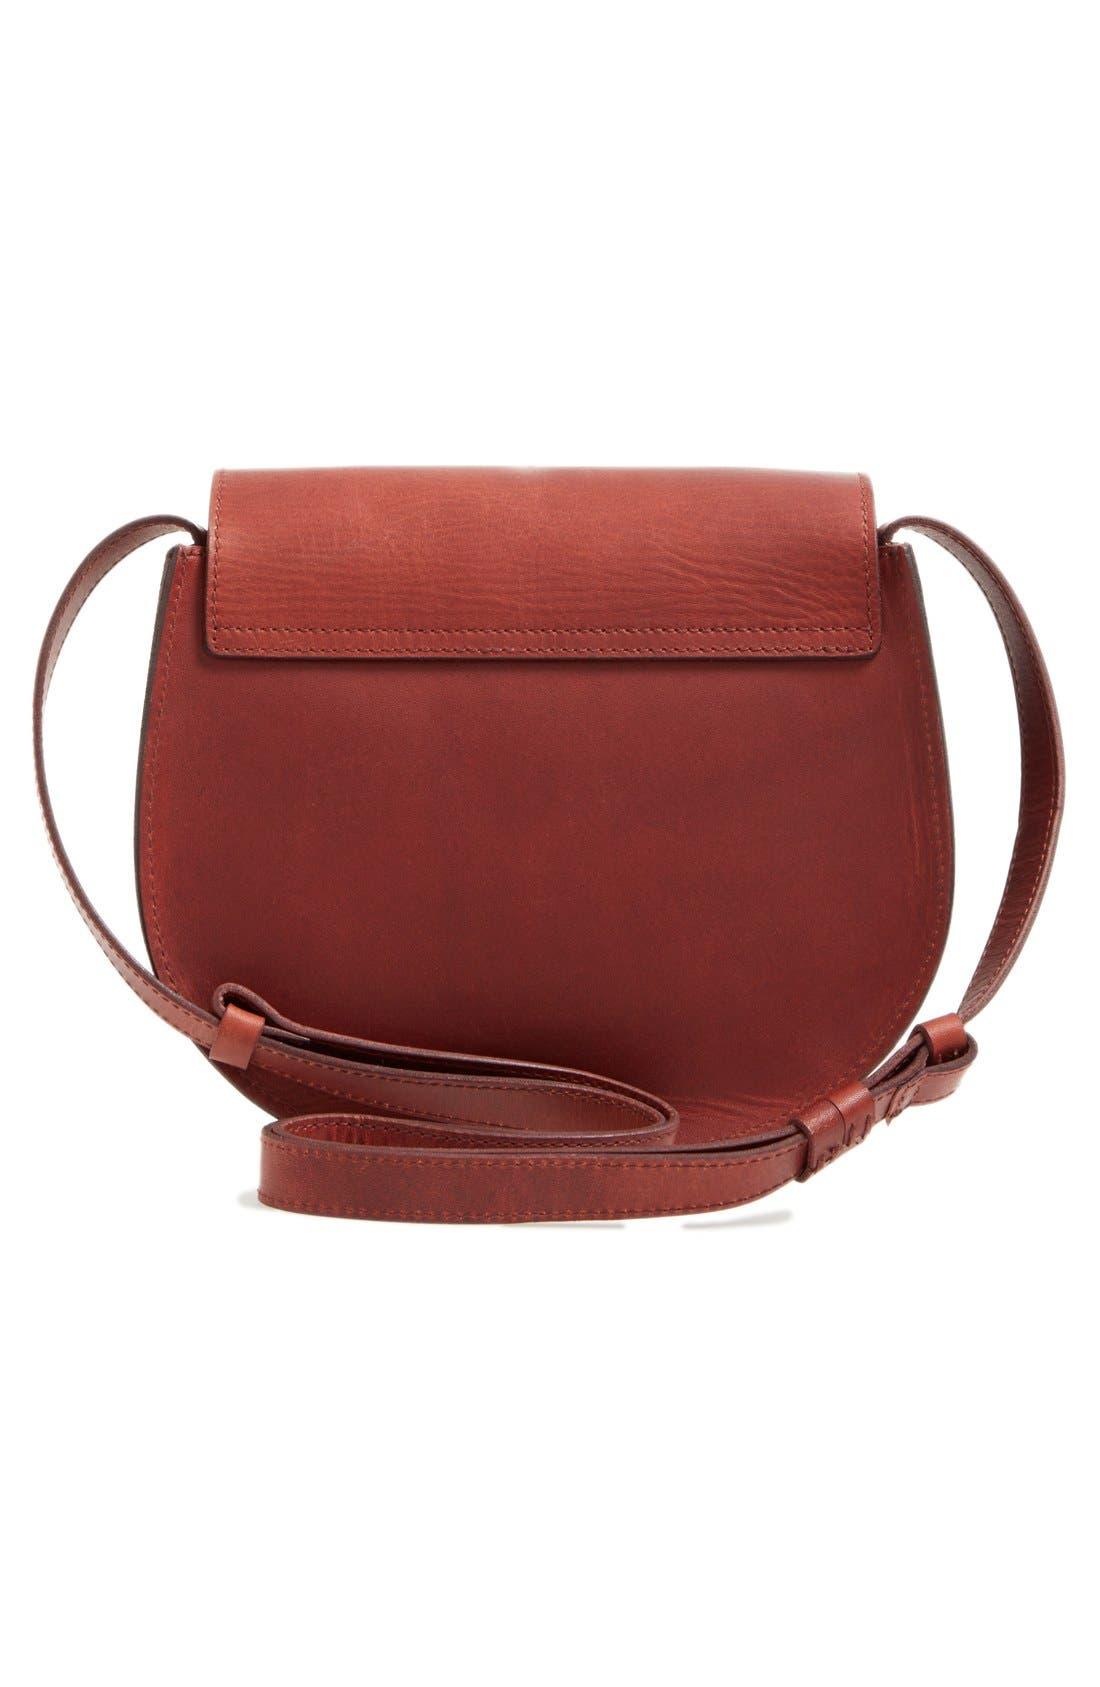 O-Ring Leather Saddle Bag,                             Alternate thumbnail 5, color,                             200